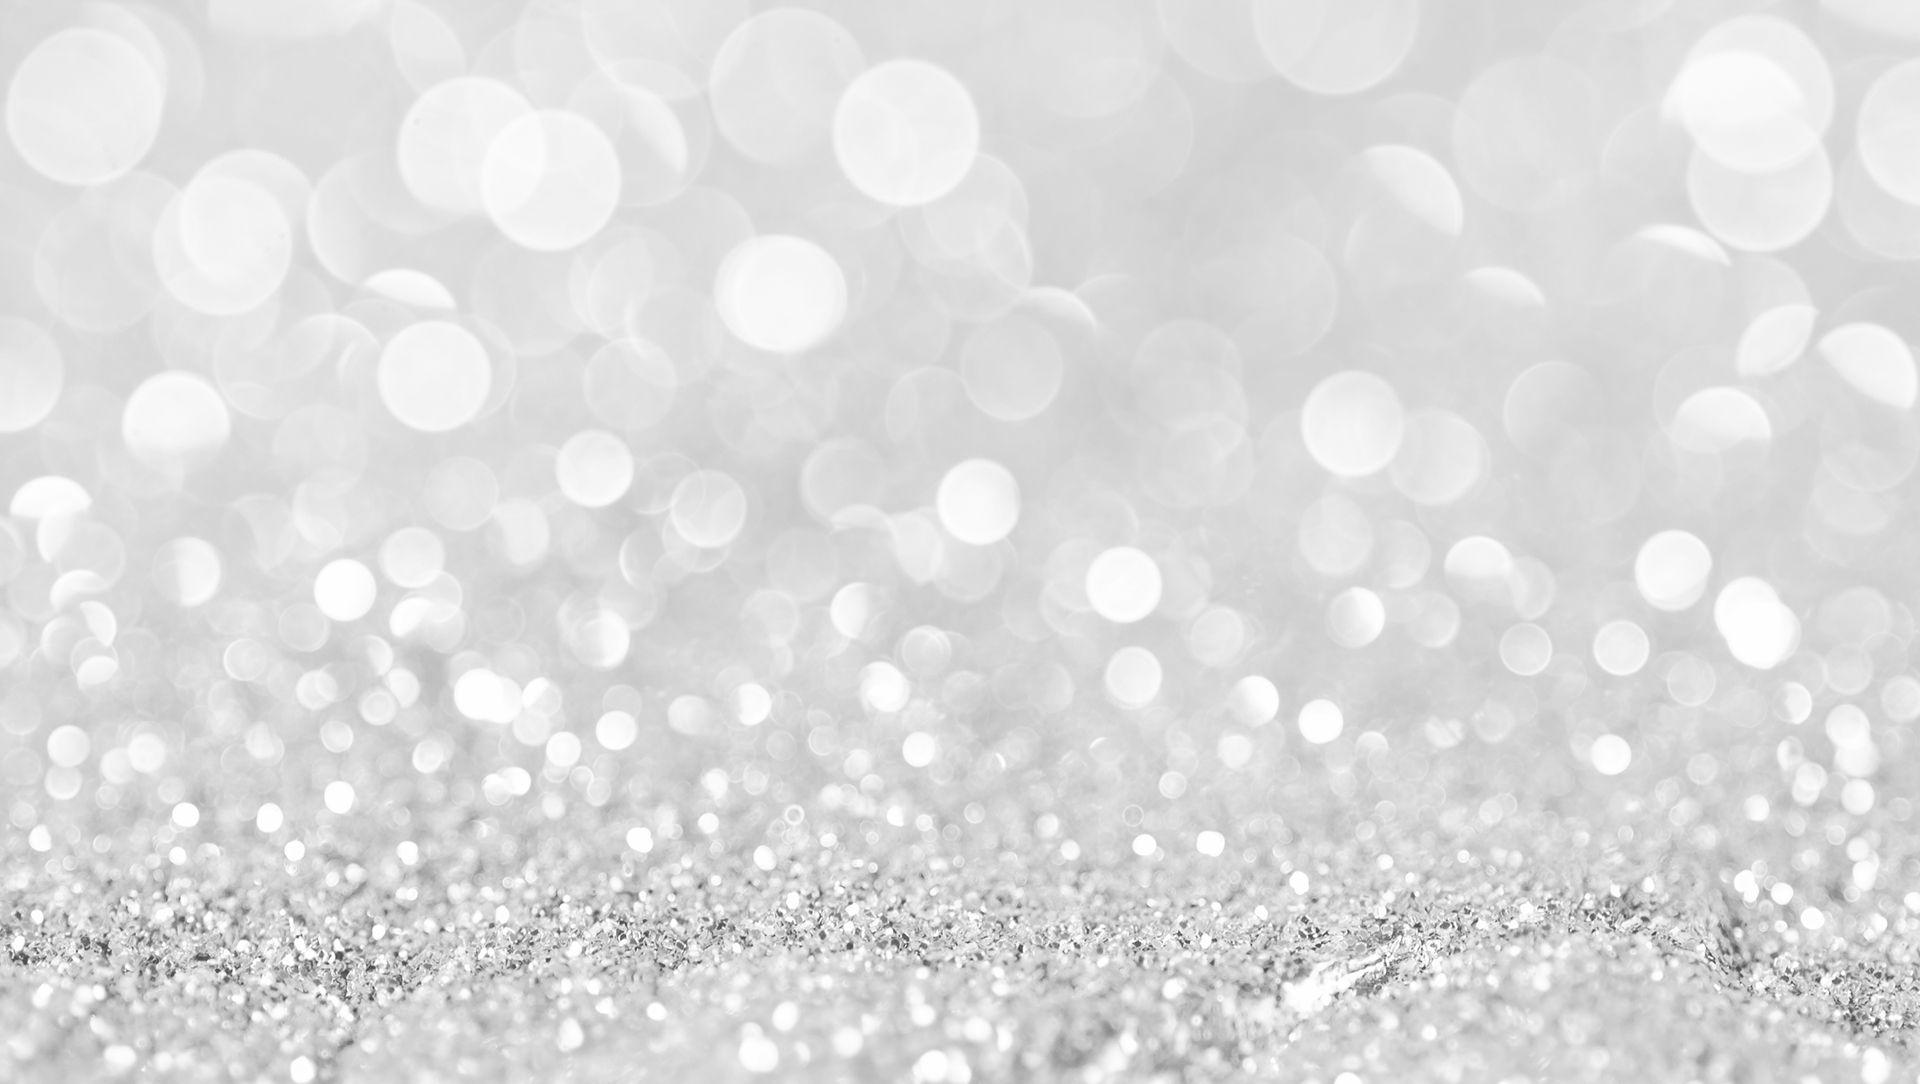 silver sparkly wallpaper high definition for desktop